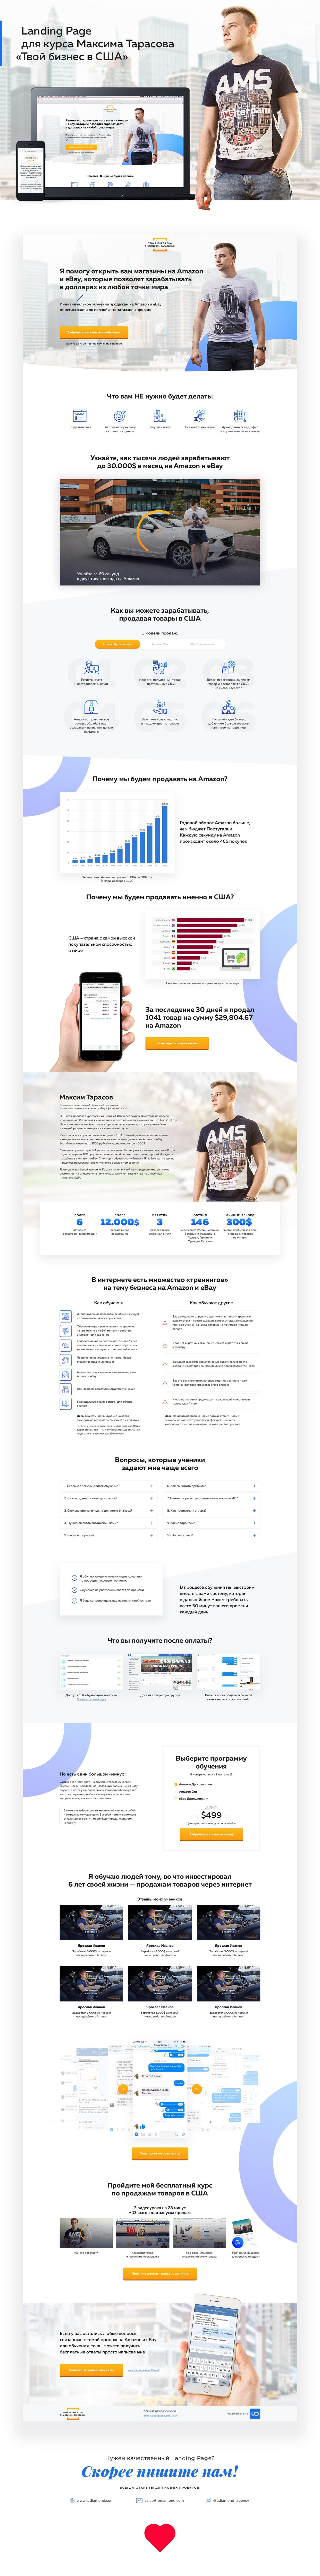 Landing Page «под ключ» для курса по Amazon и eBay от Максима Тарасова